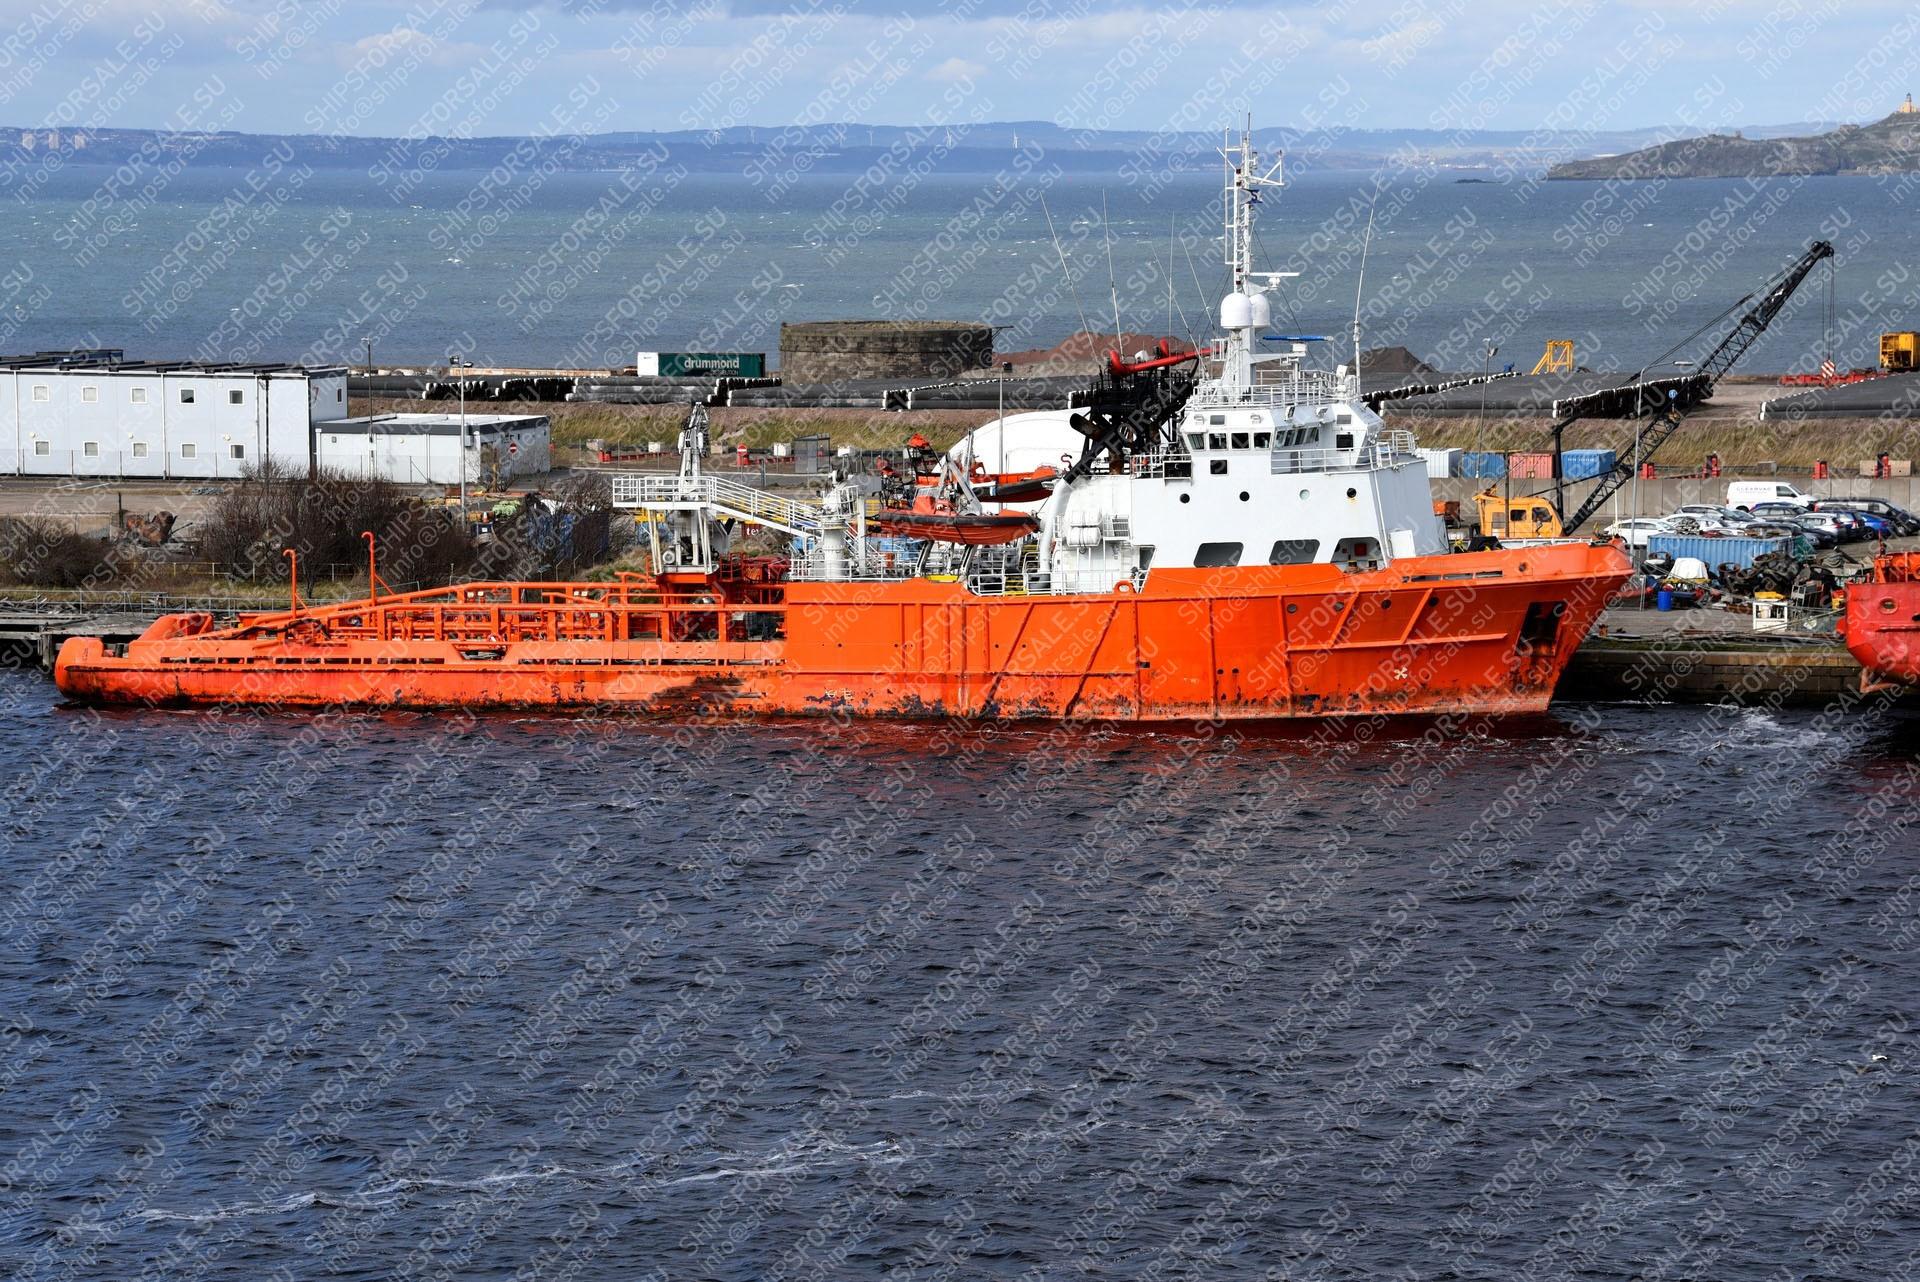 Offshore platform supply vessel TBN0762